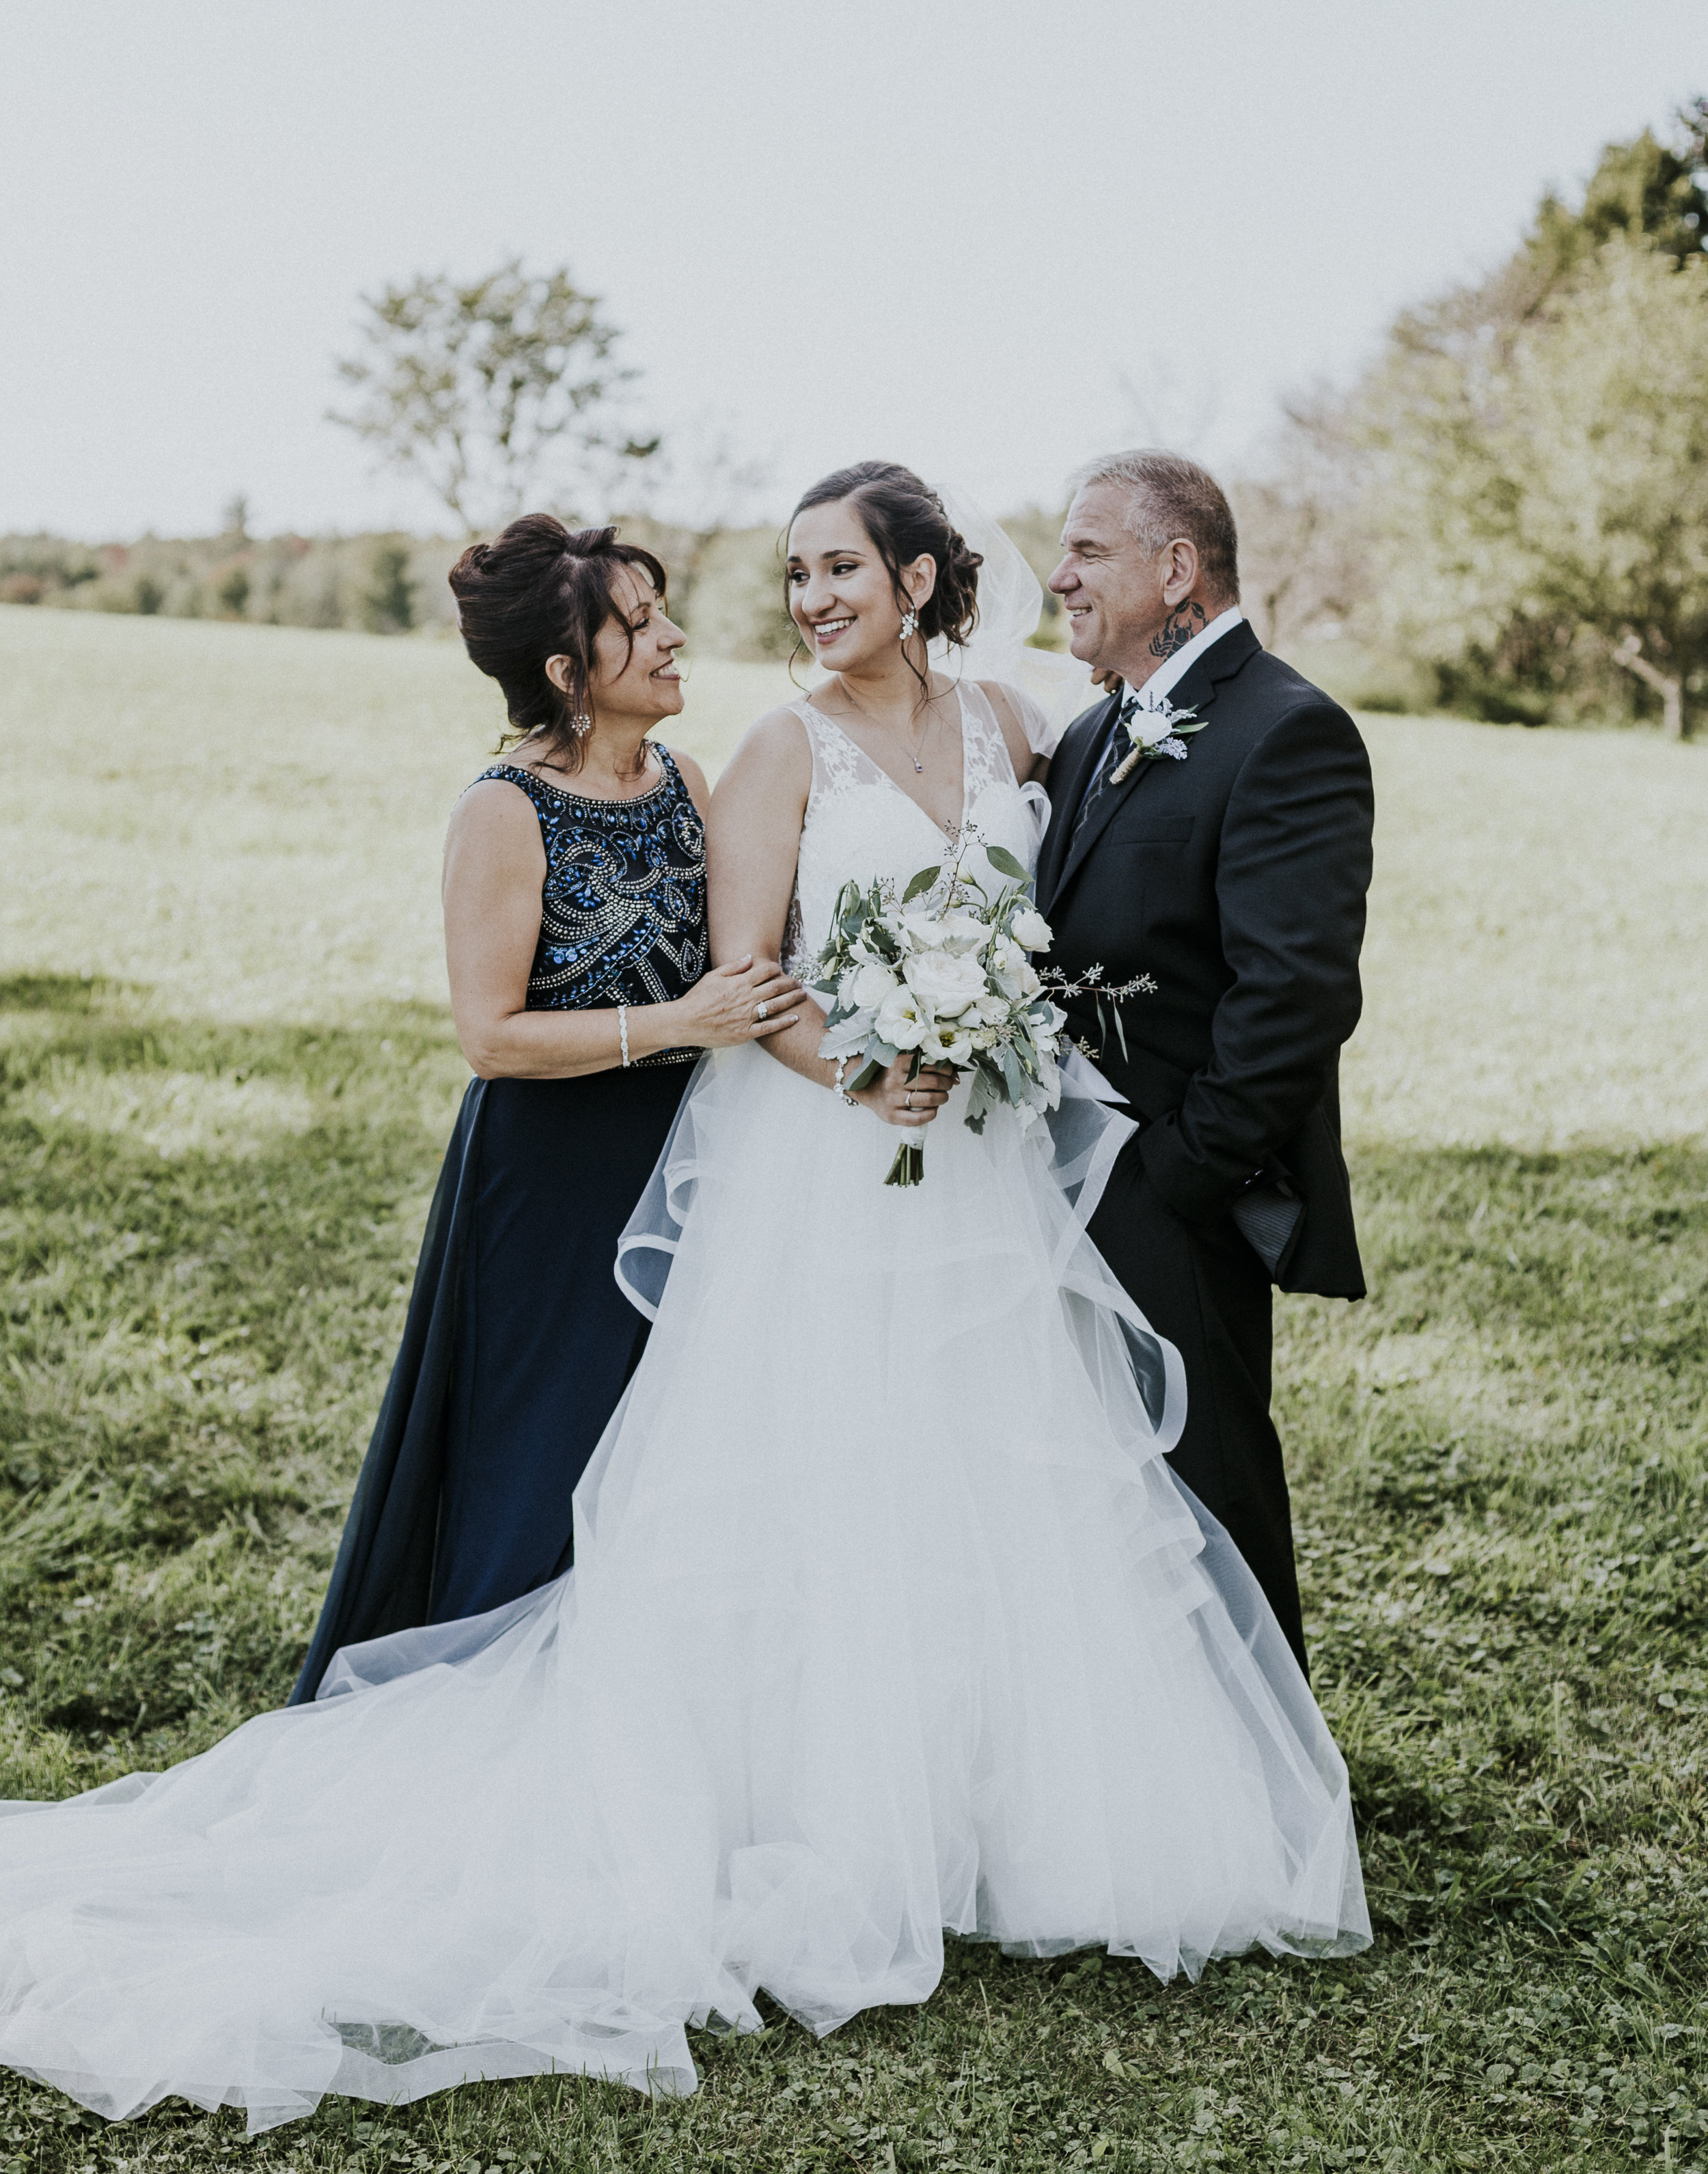 FORMALS + WEDDING PARTY-011.jpg